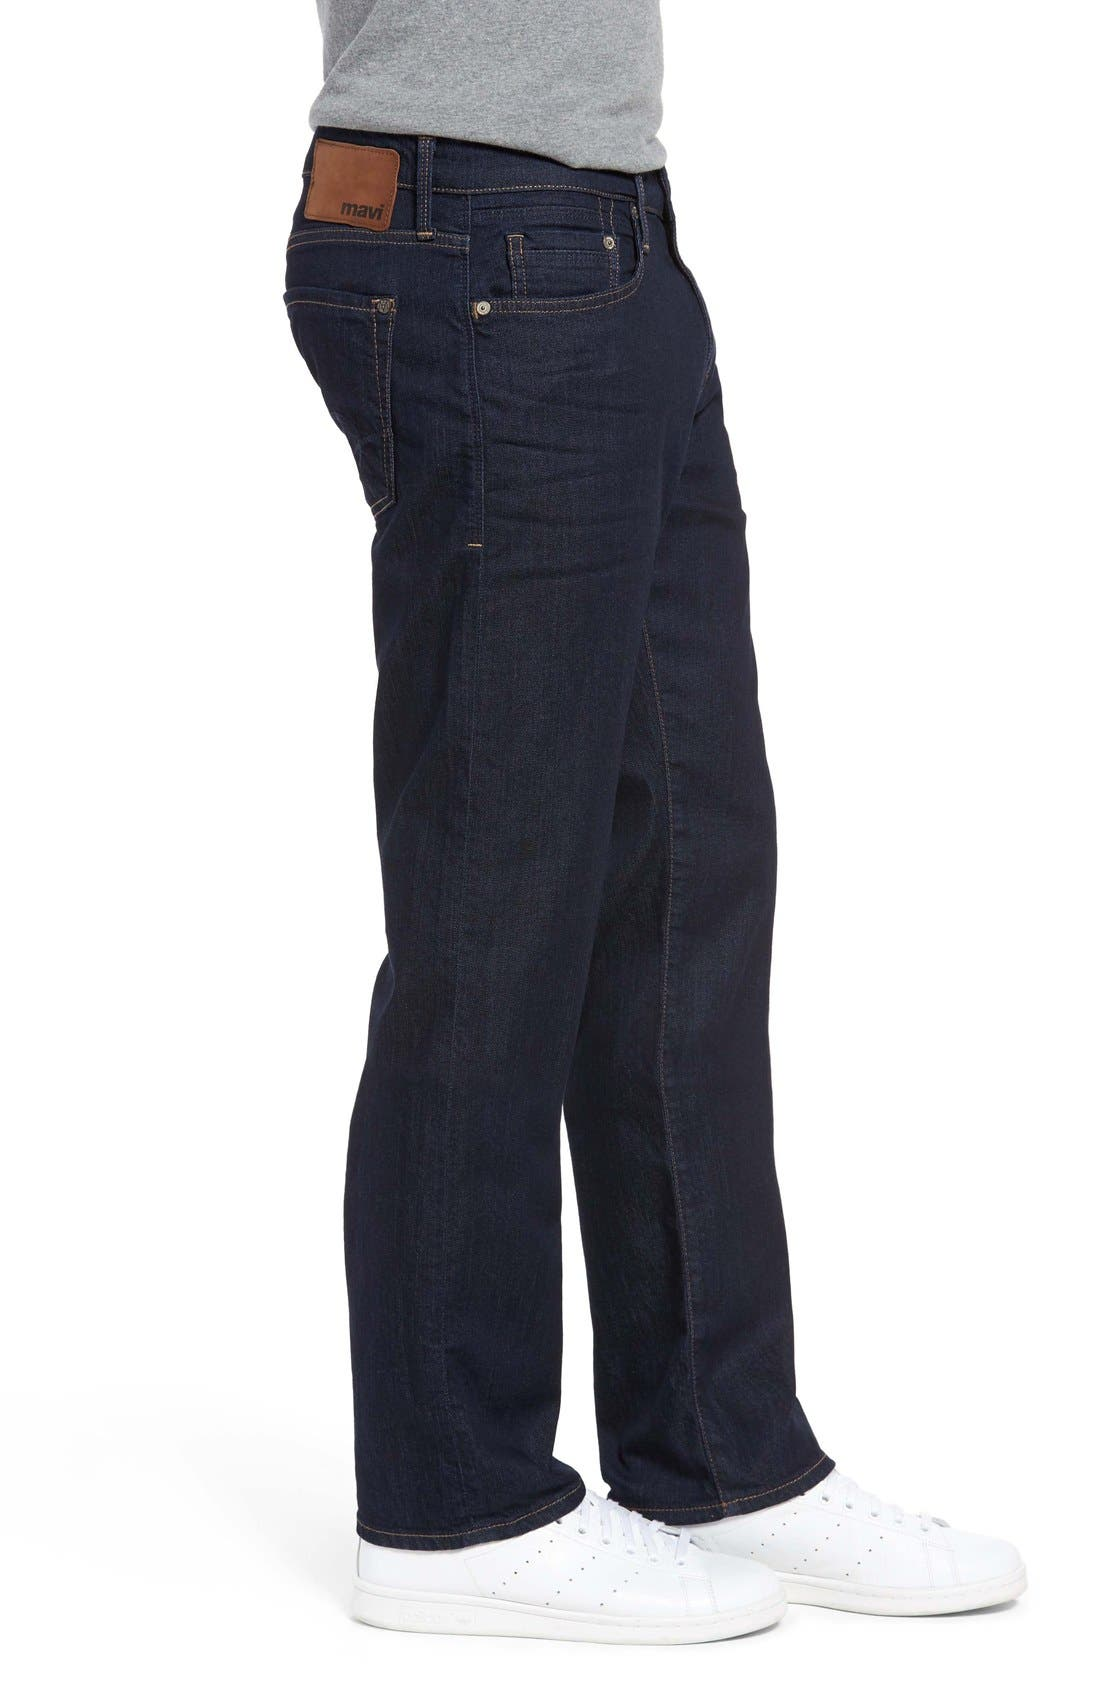 Alternate Image 3  - Mavi Jeans 'Zach' Straight Leg Jeans (Dark Blue)